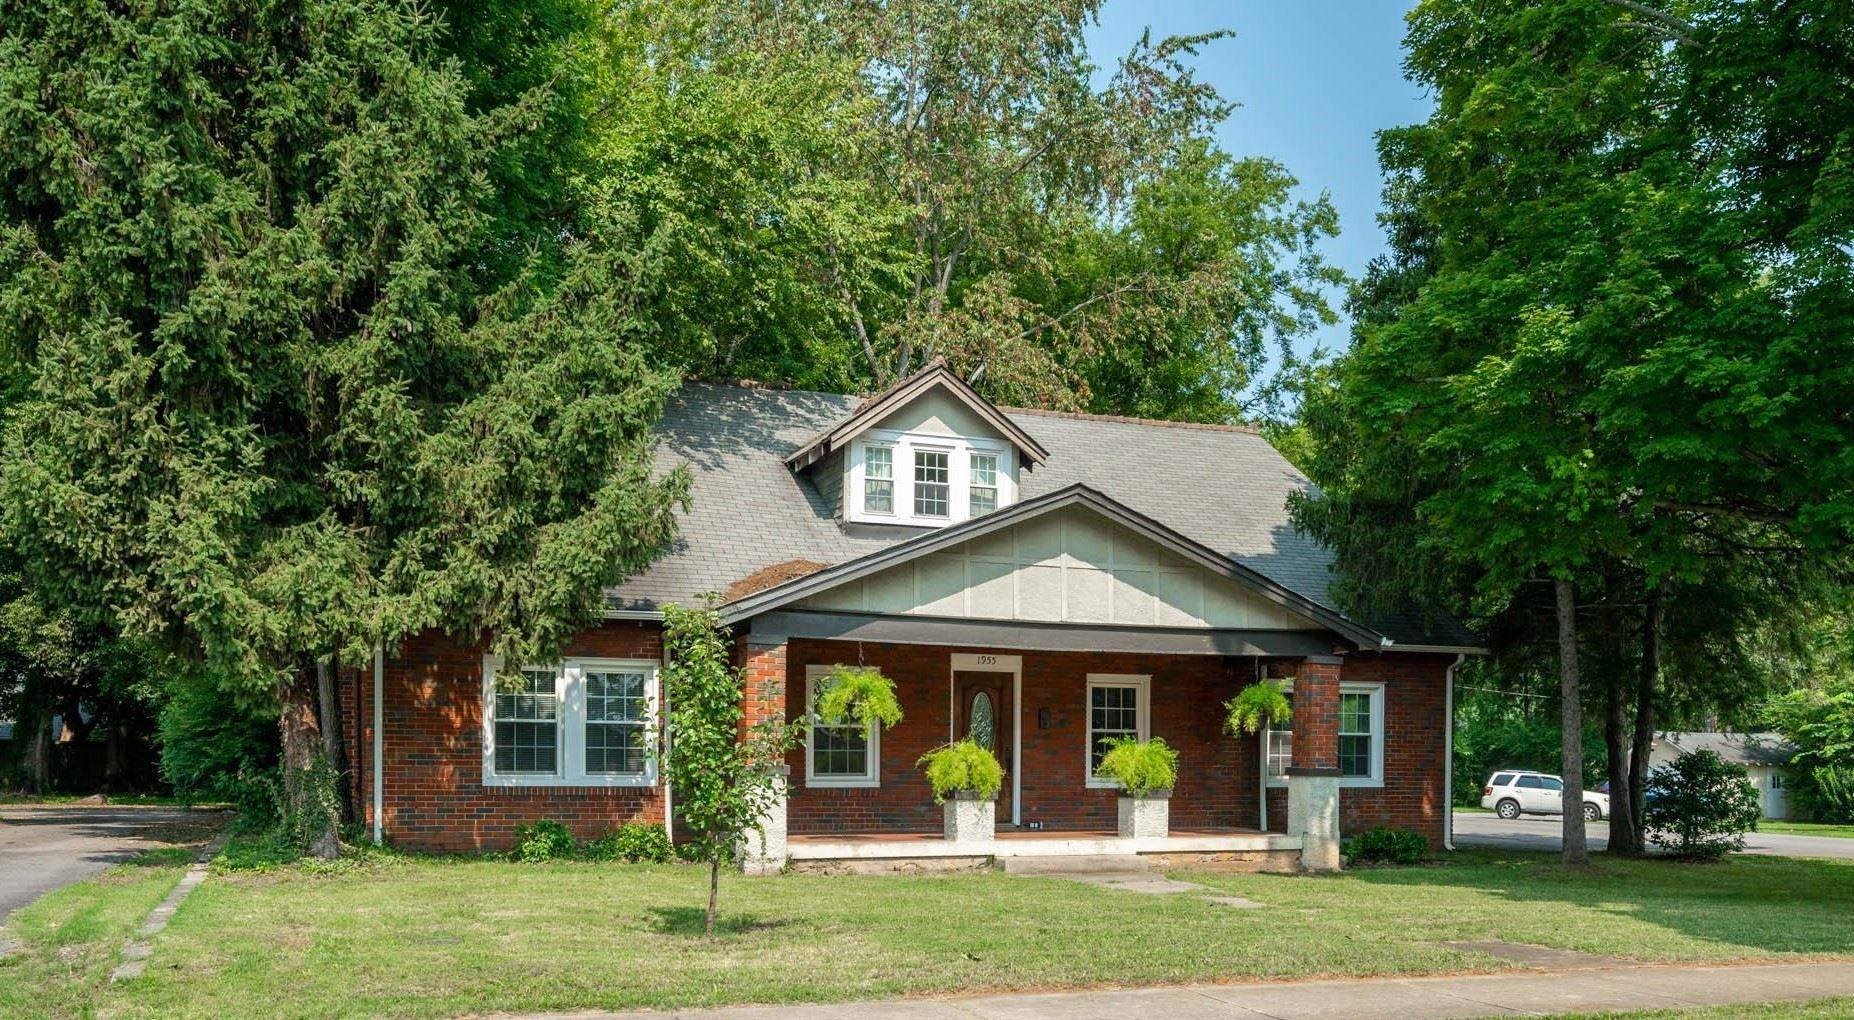 1955 Middle Tennessee Blvd, Murfreesboro, TN 37130 - MLS#: 2274852